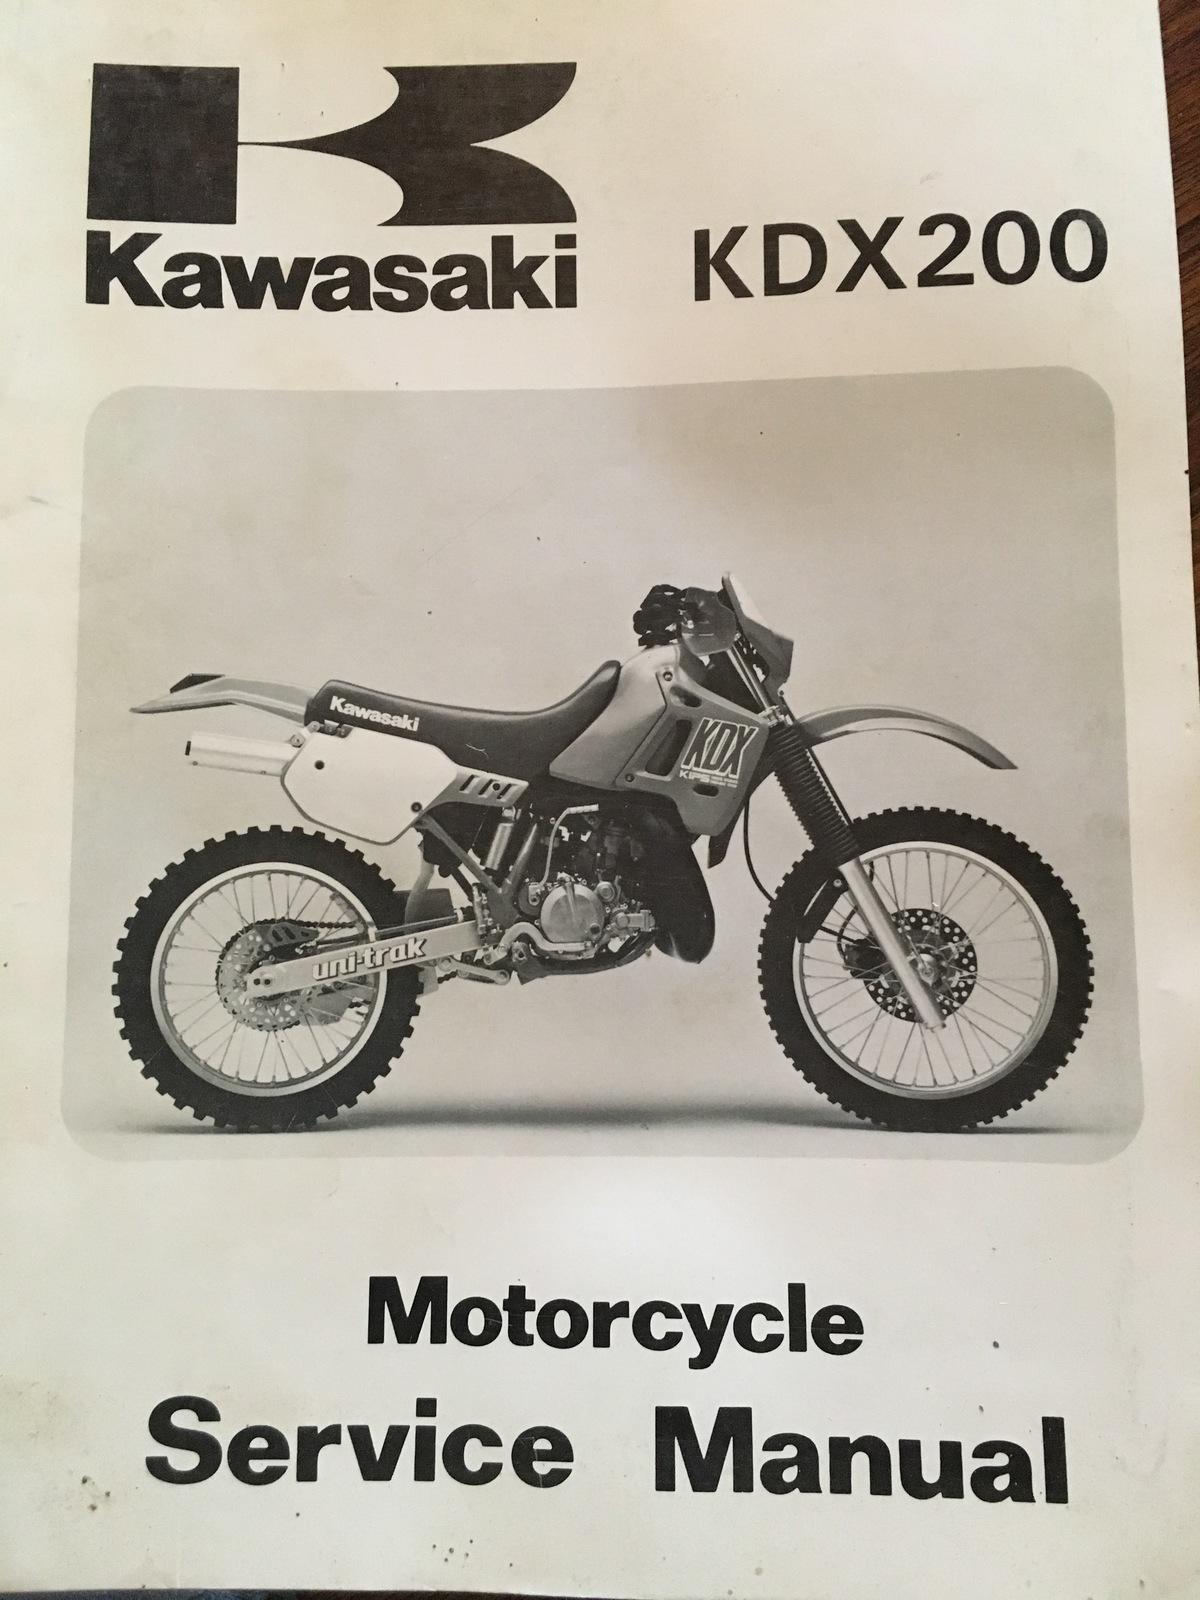 KAWASAKI KDX200 1989 SERVICE MANUAL